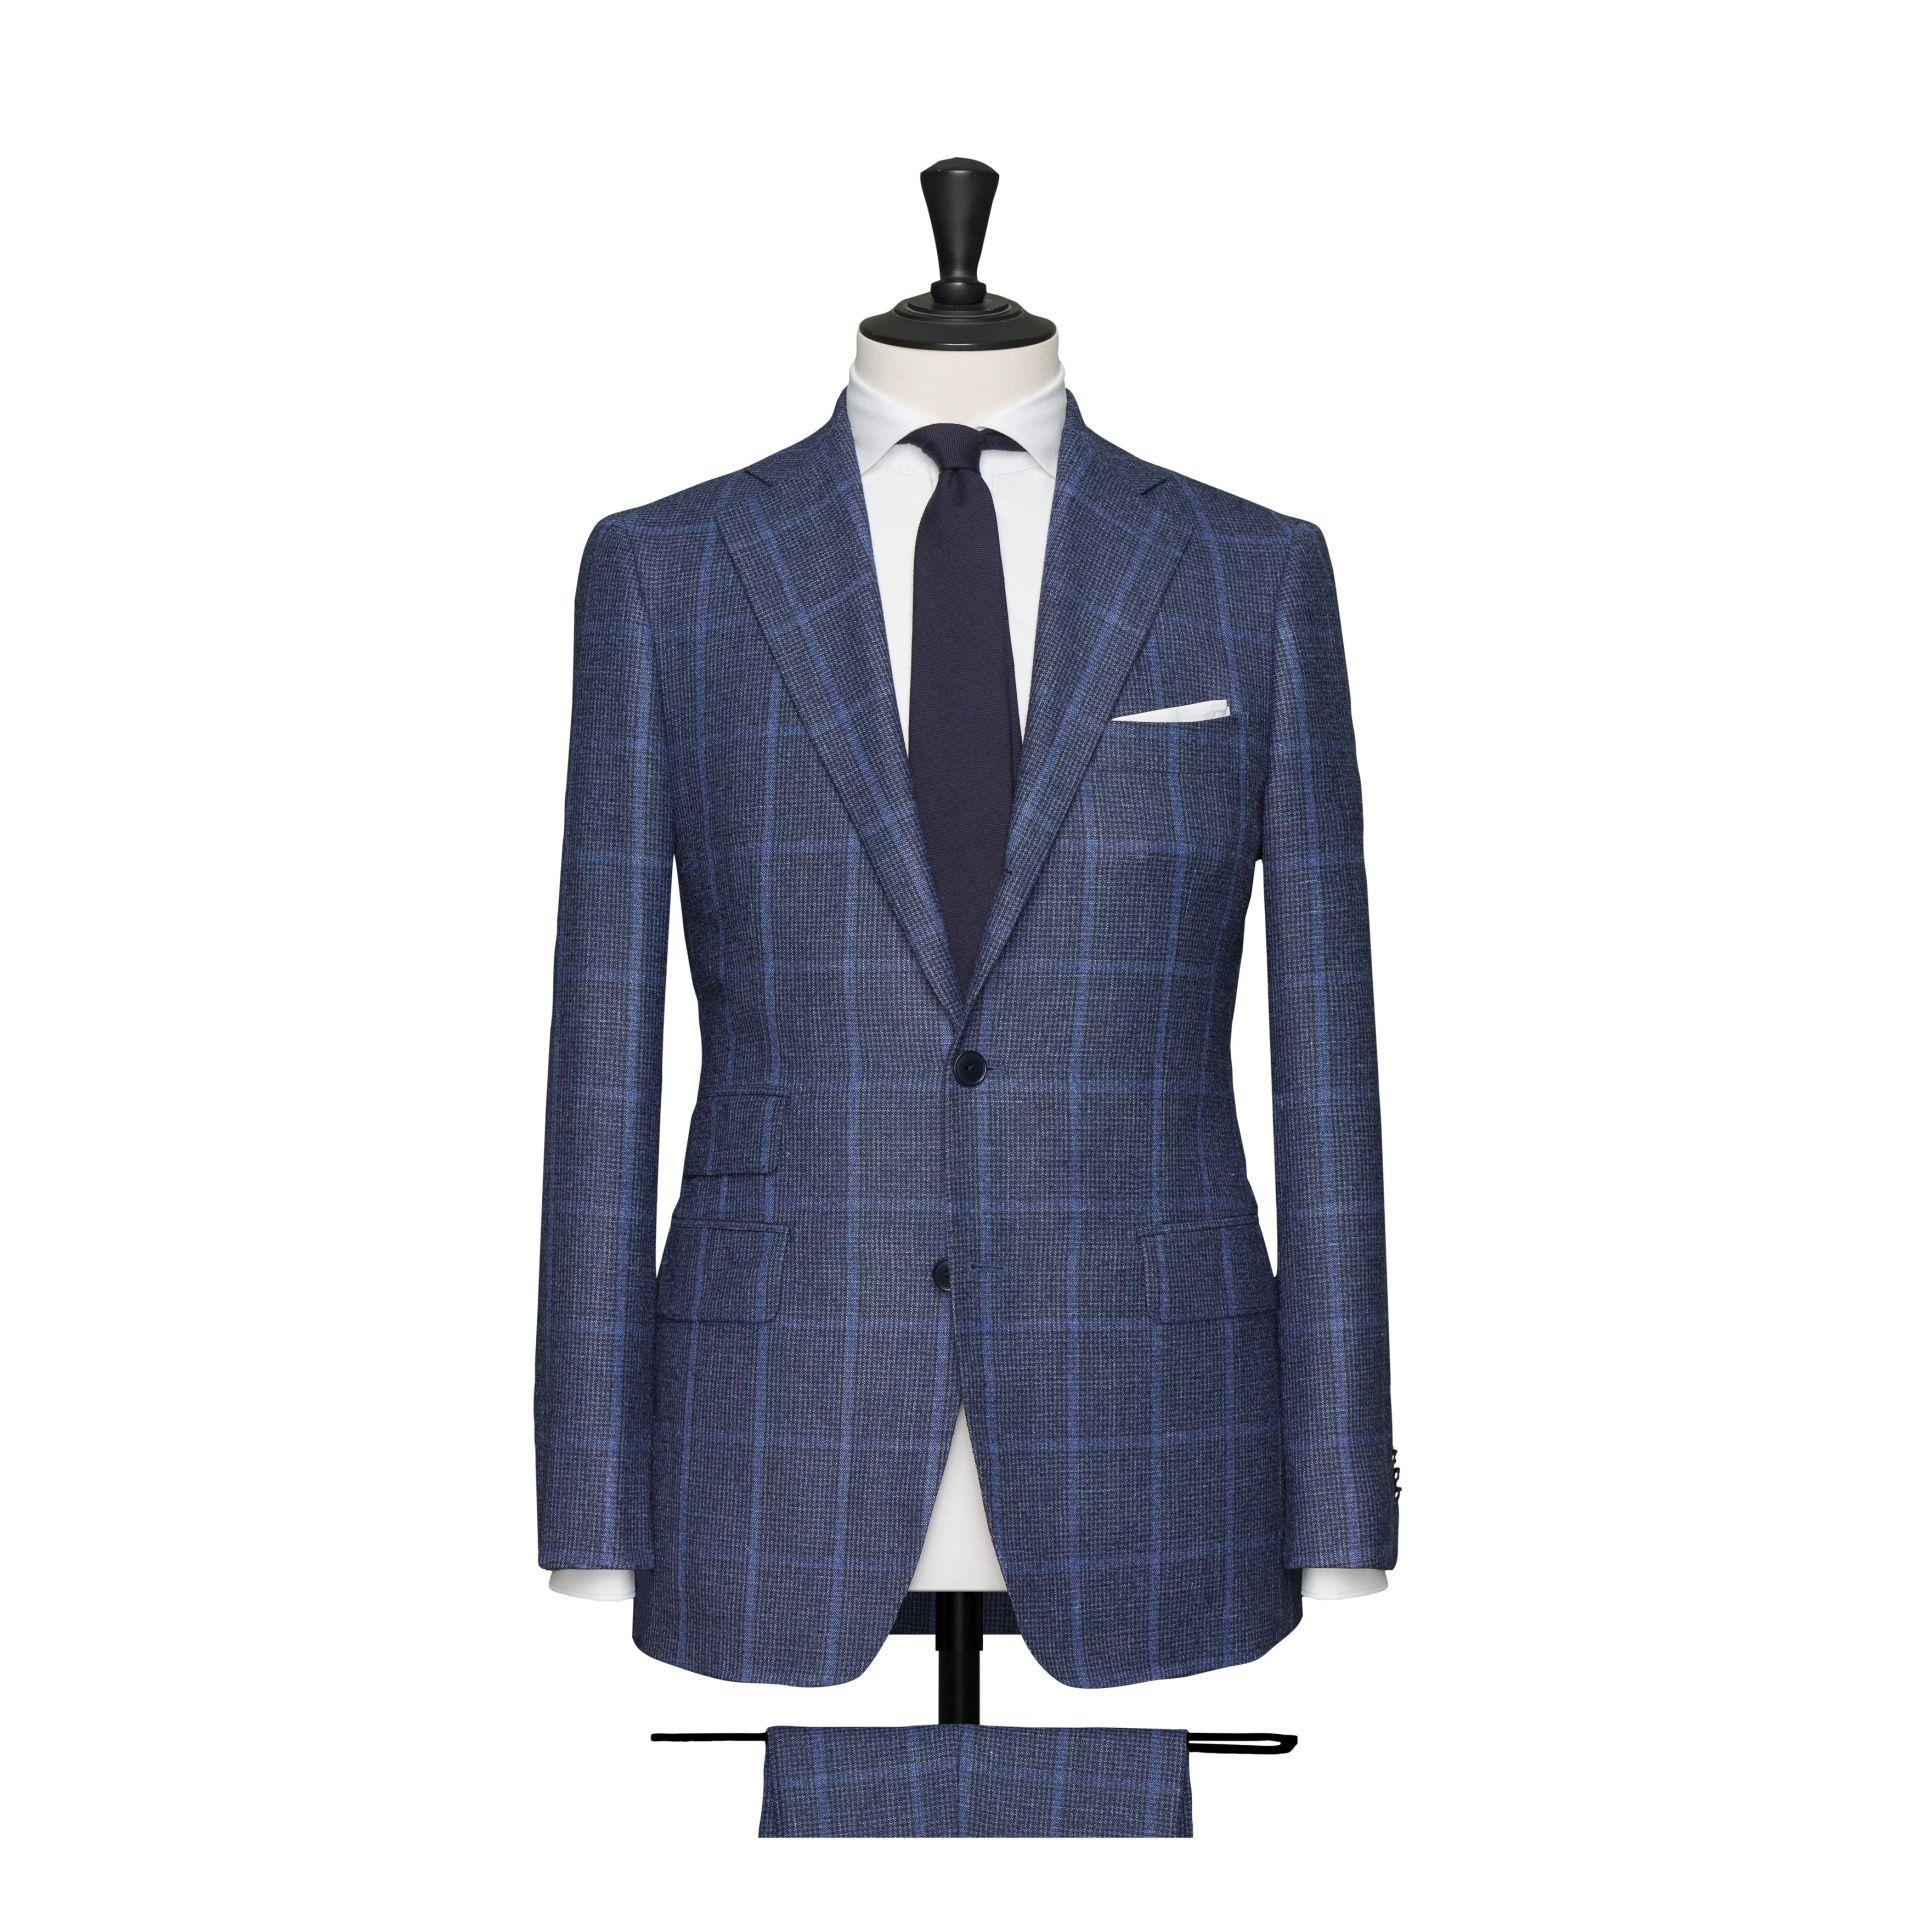 Costume grands carreaux, 2 boutons, 3 poches - Bleu indigo